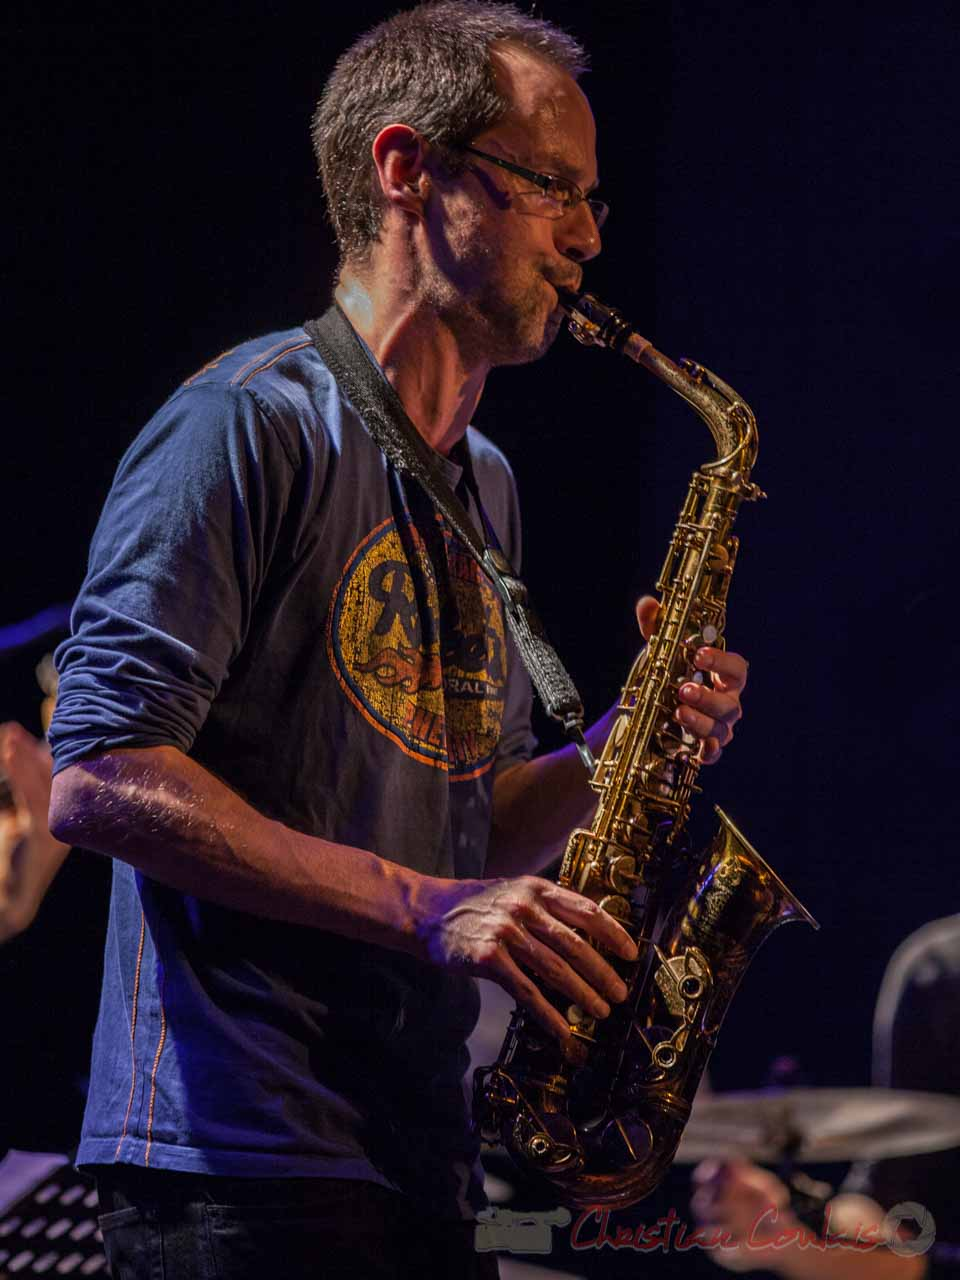 Julien Dubois, Festival JAZZ360 2016, Cénac, 10/06/2016 6/6G